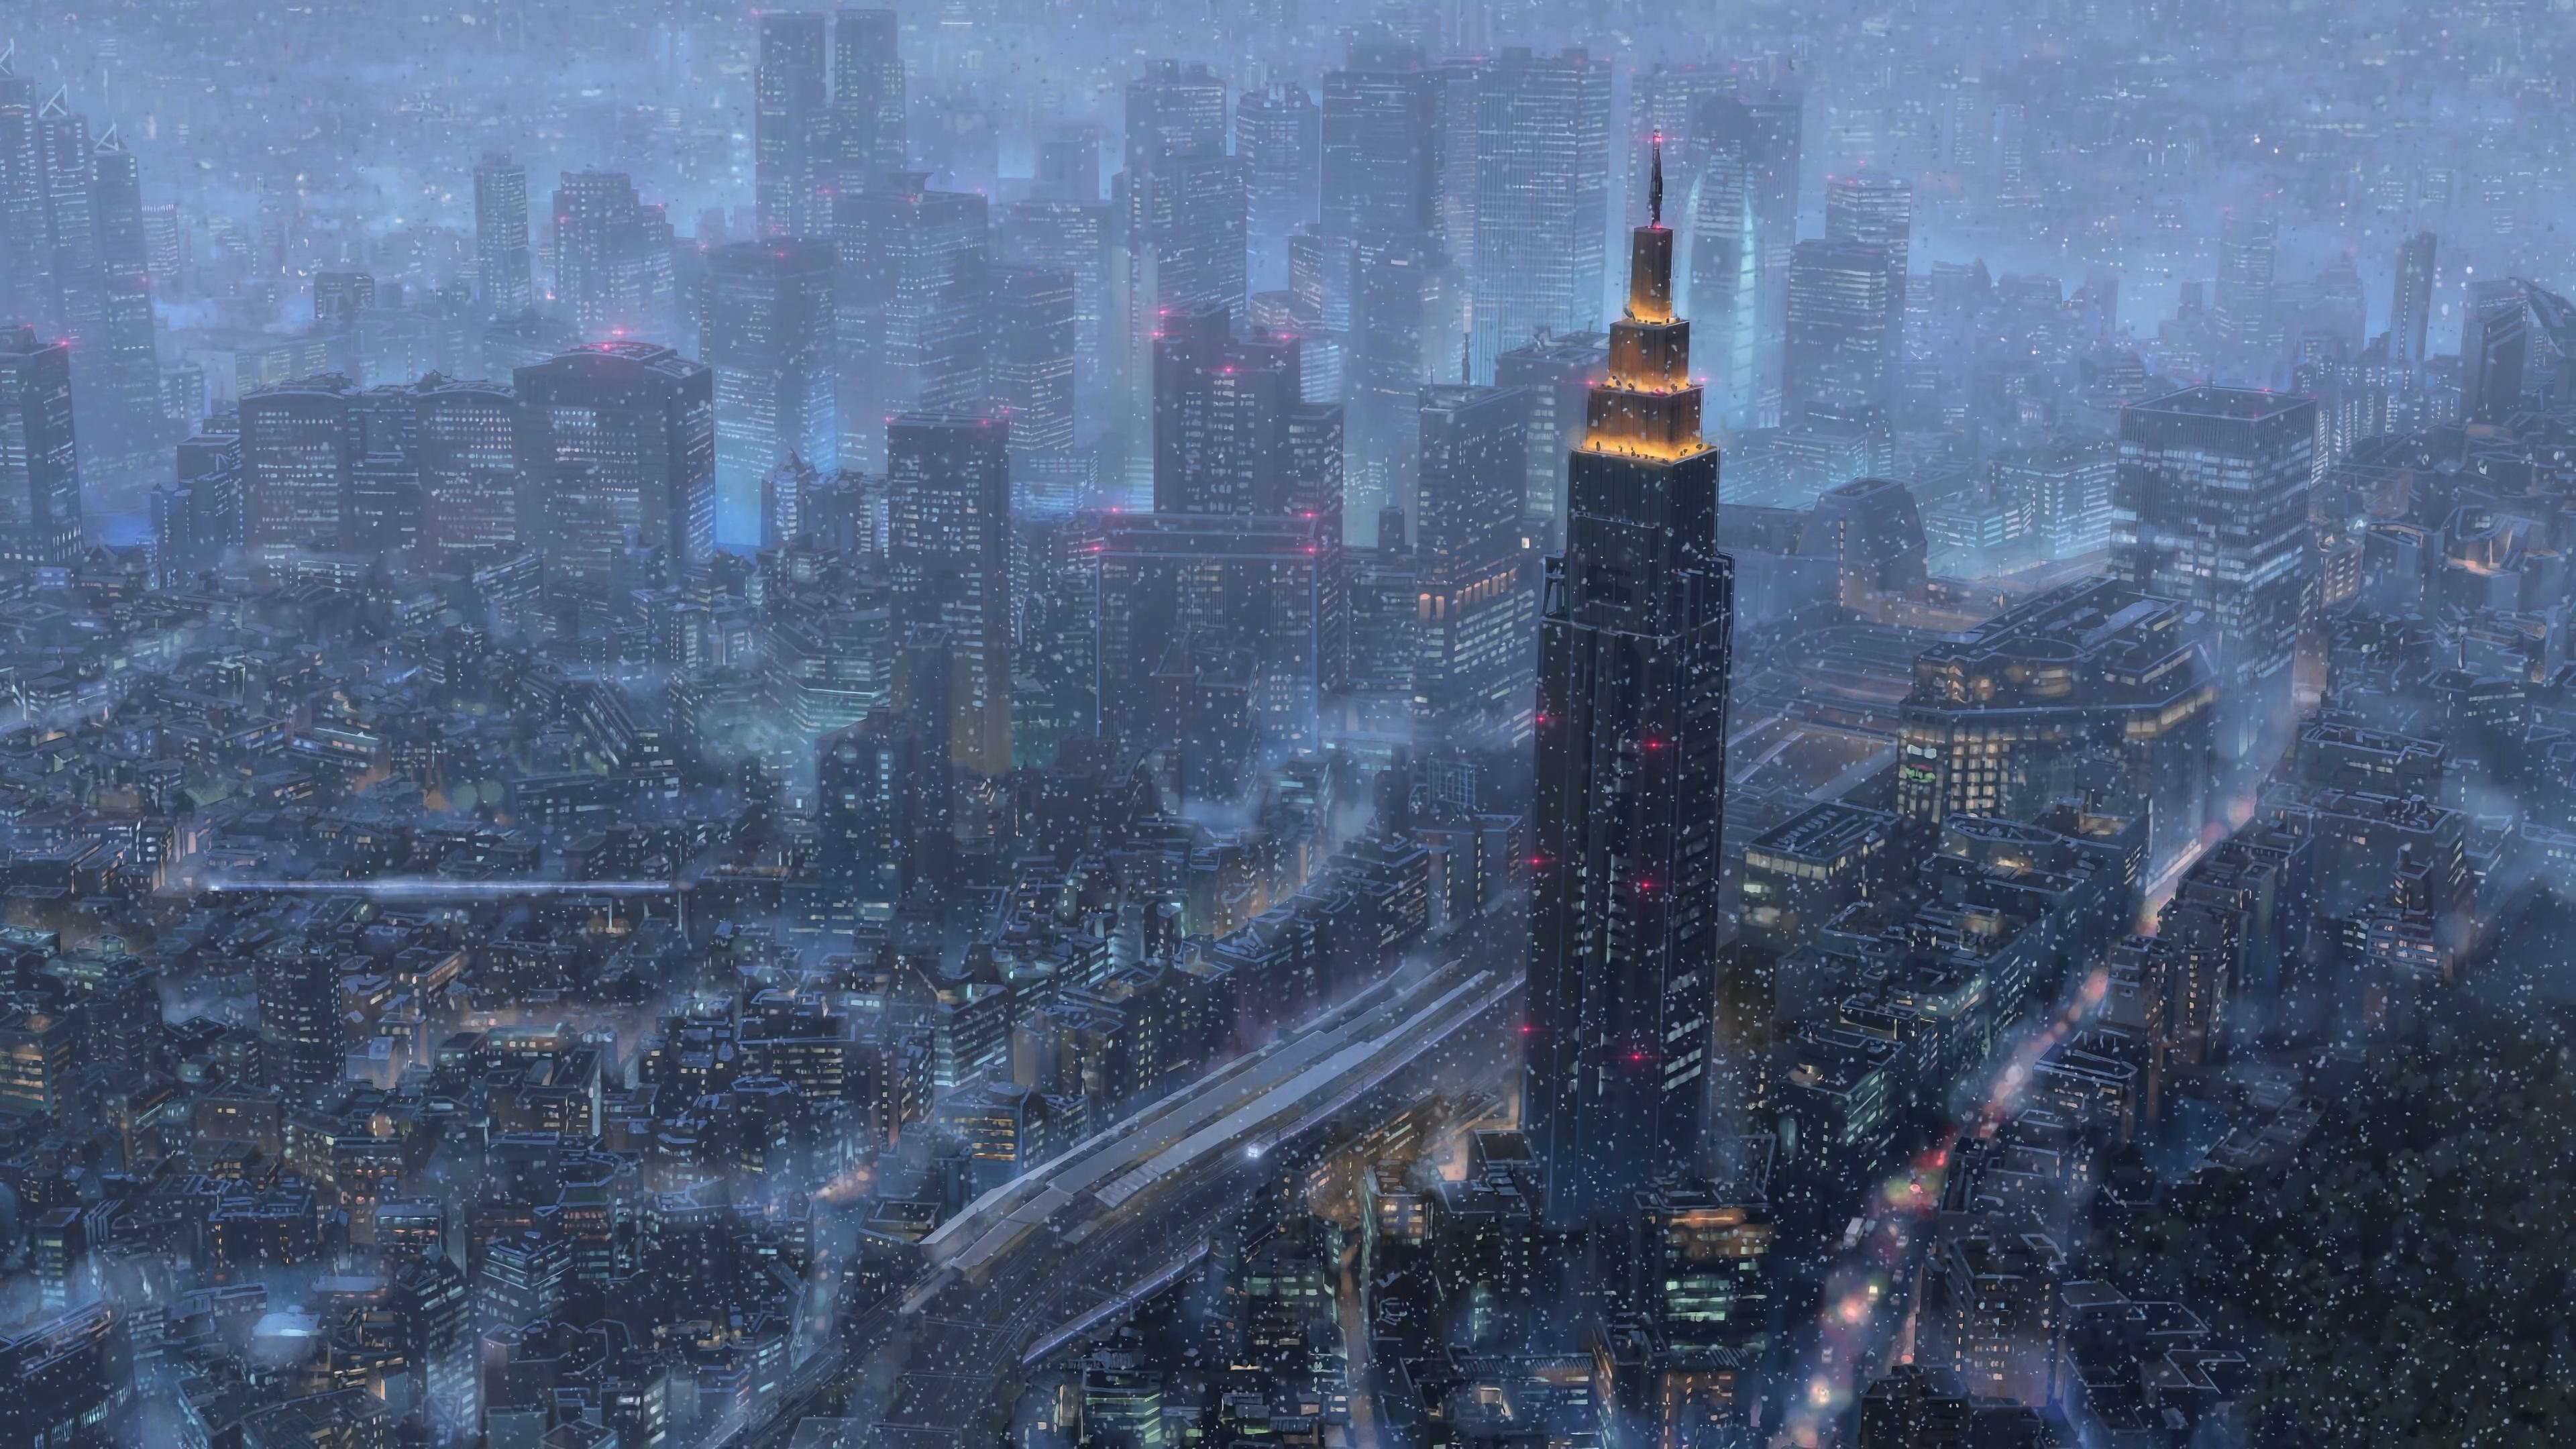 Anime 3840x2160 Makoto Shinkai Kimi no Na Wa cityscape